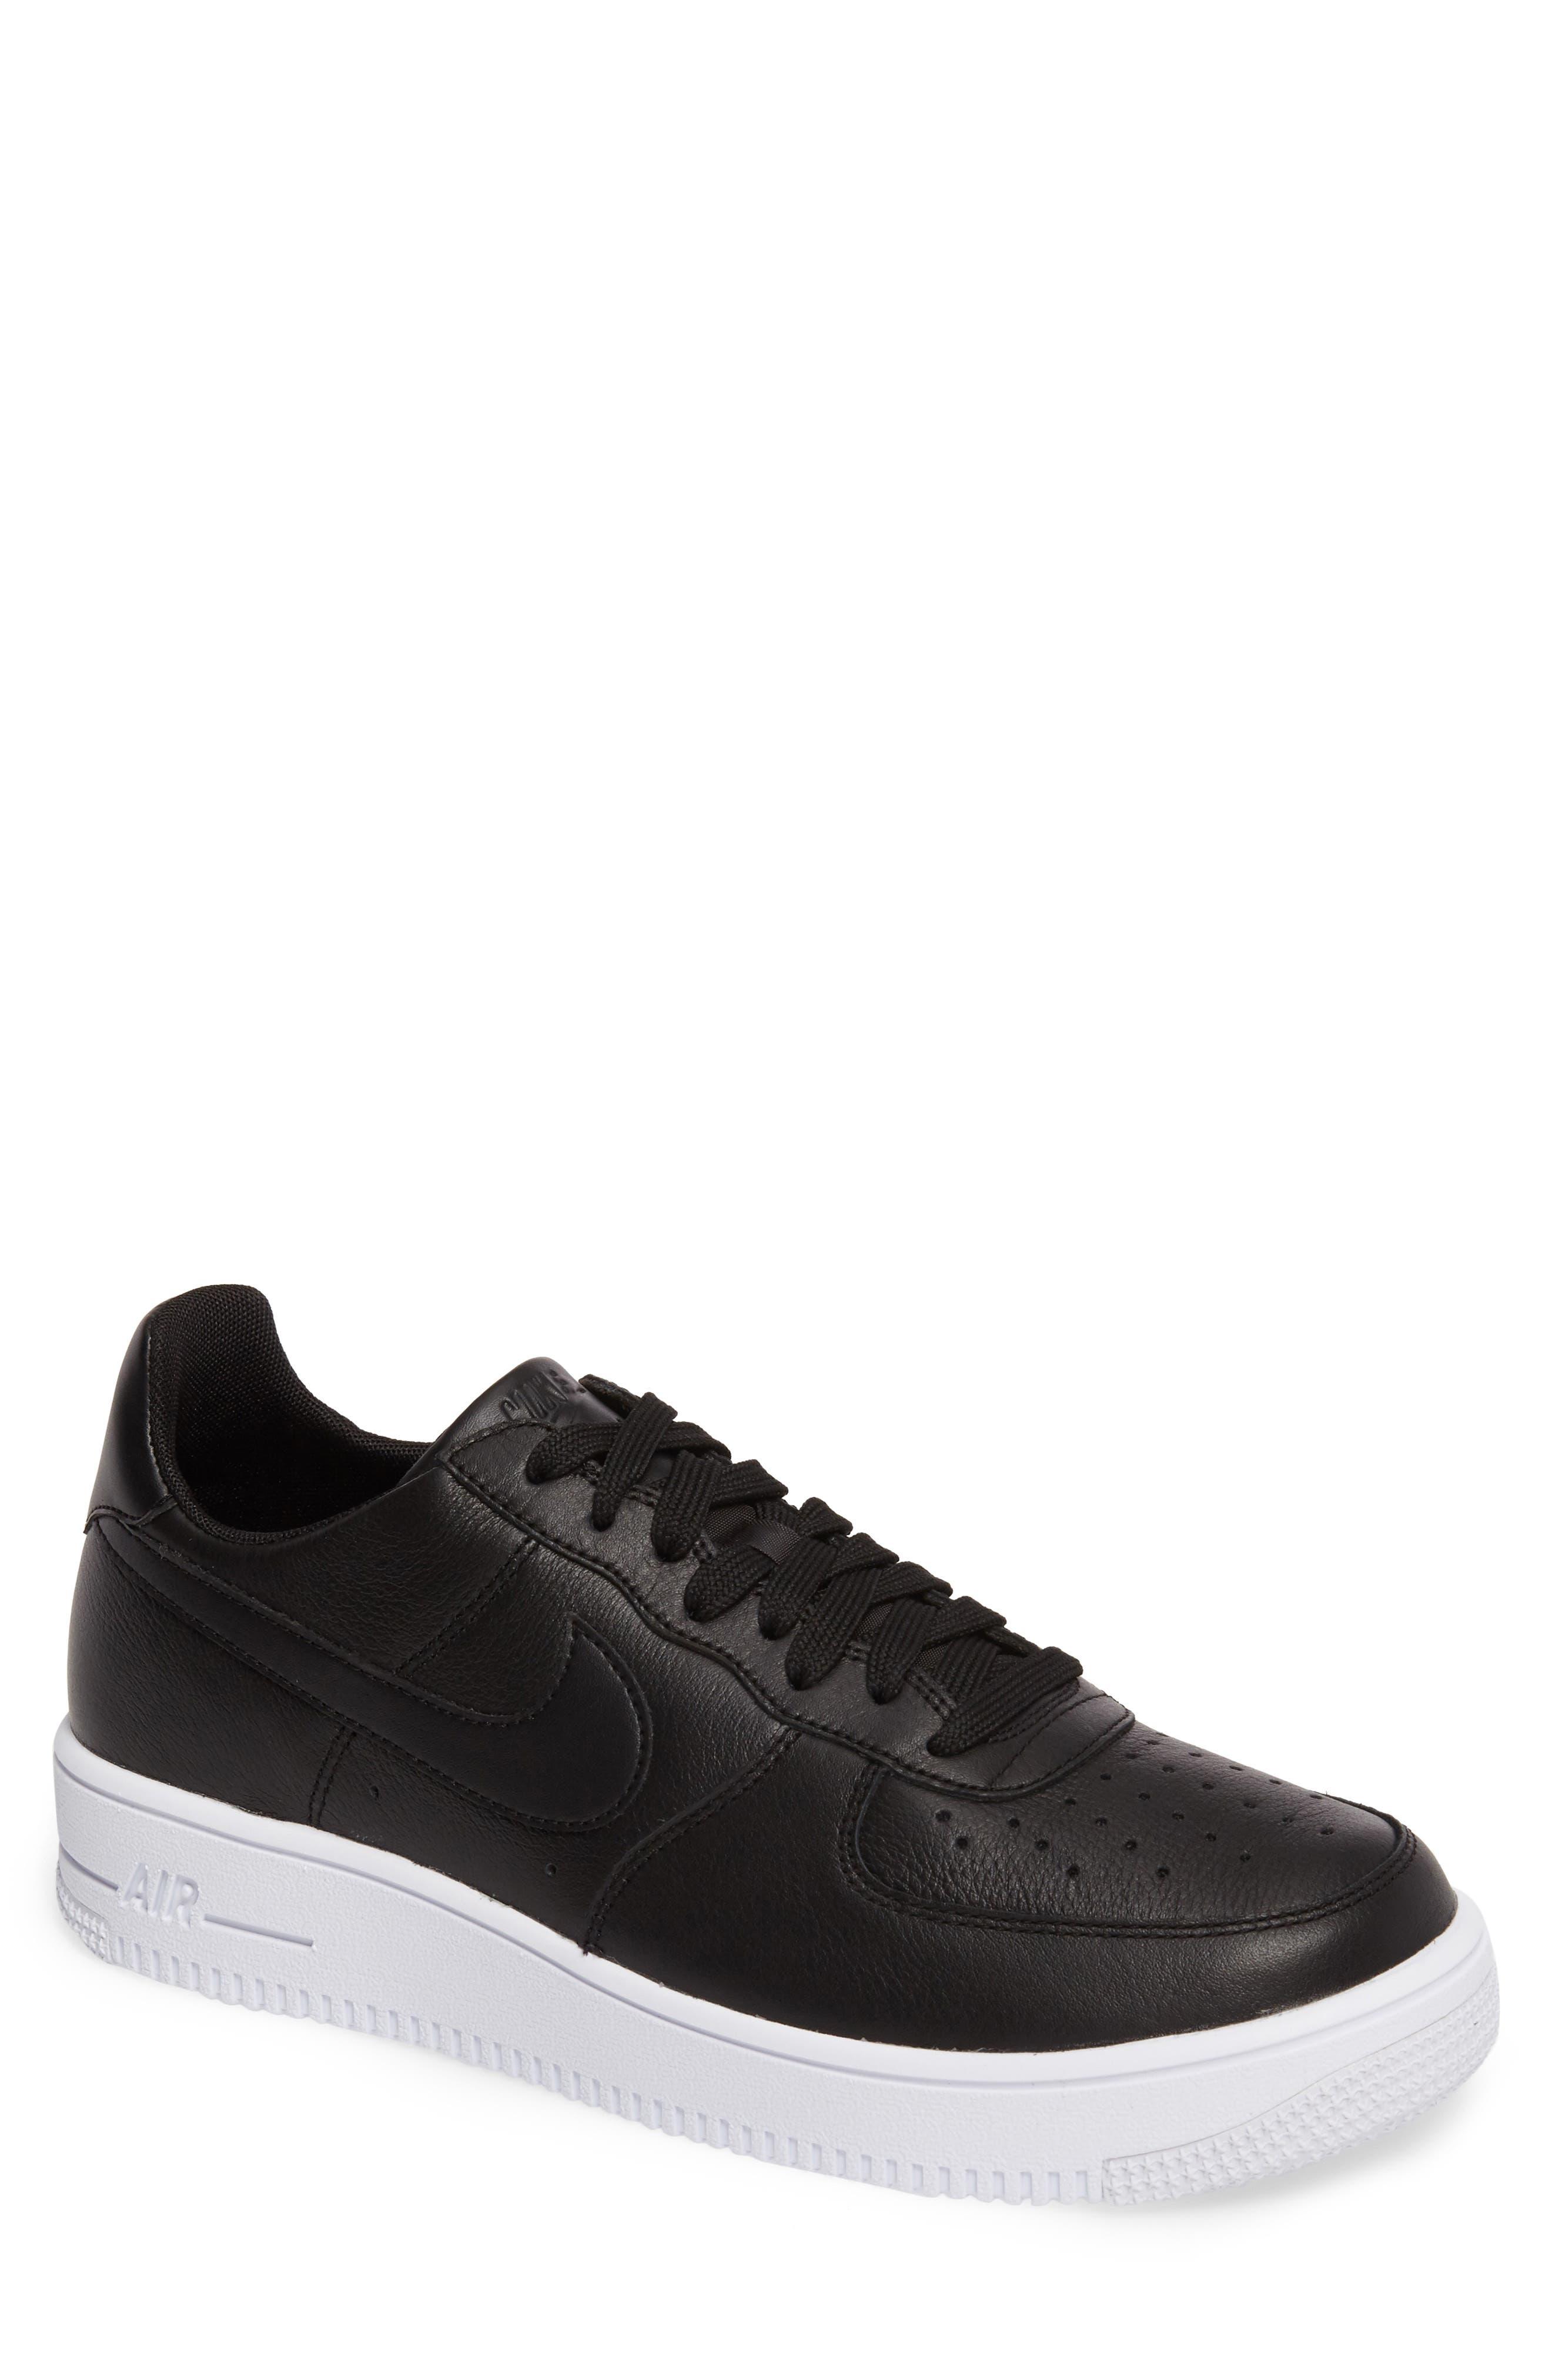 Air Force 1 Ultraforce Sneaker,                         Main,                         color,